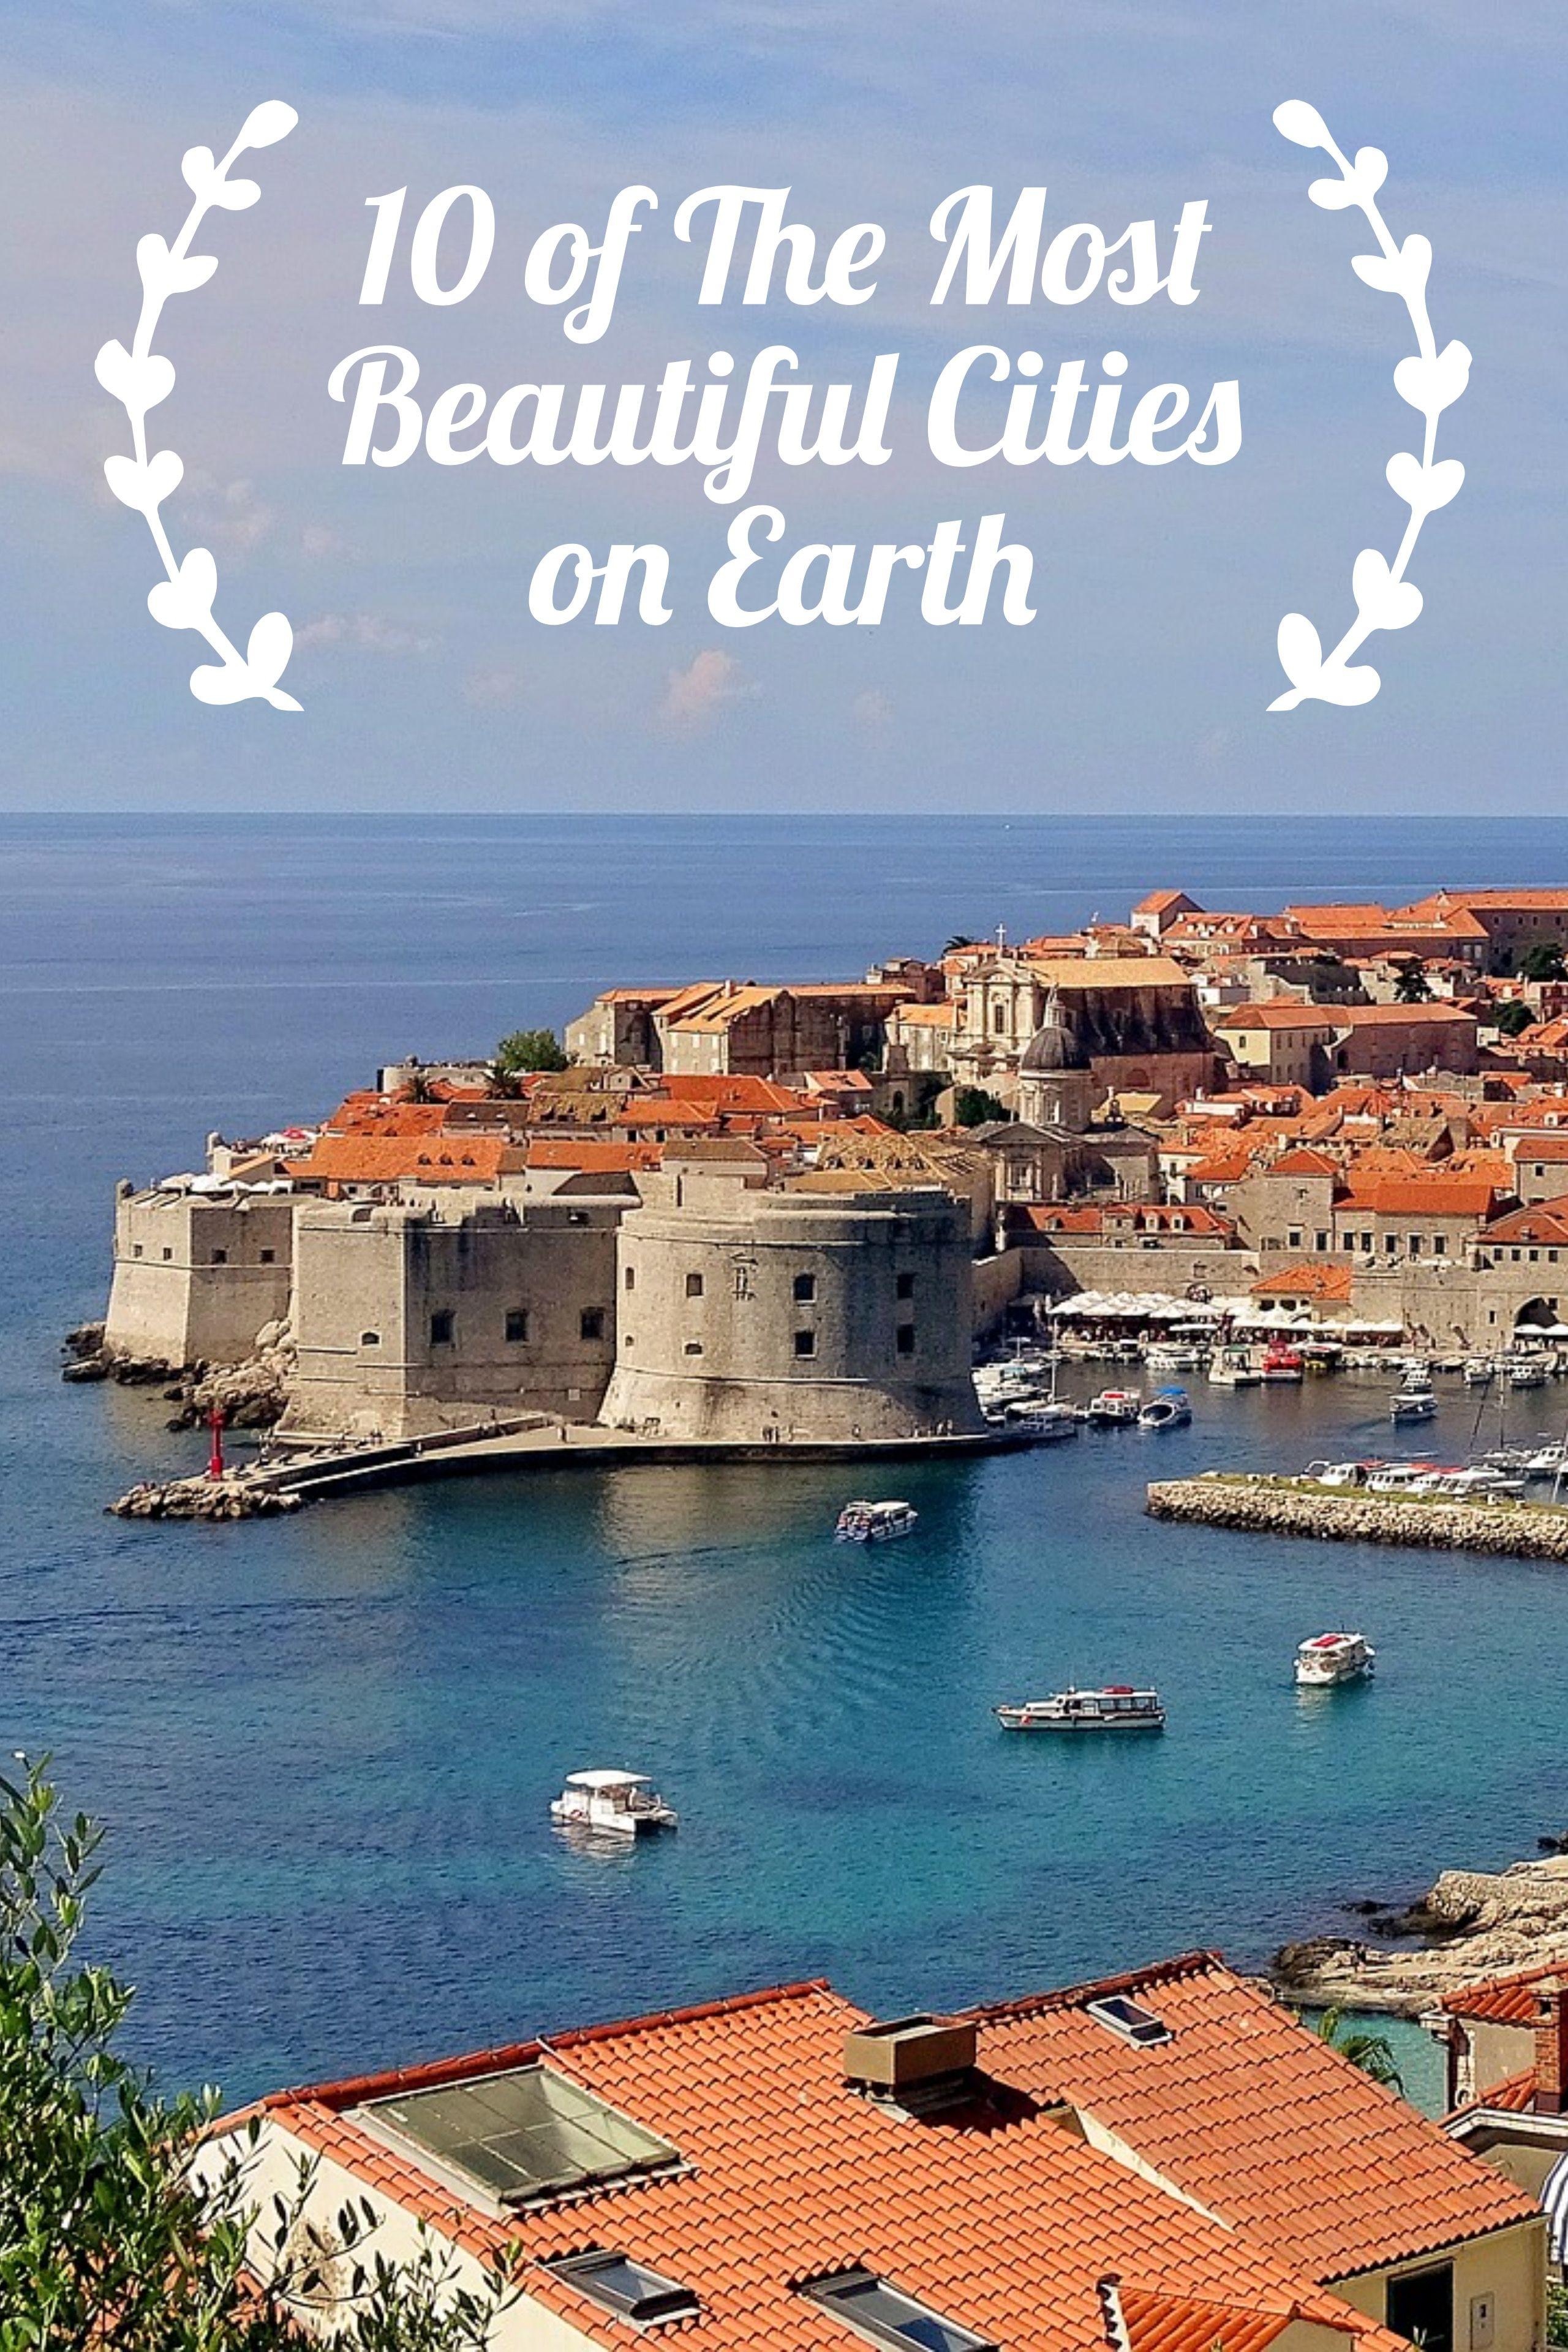 Dubrovnik Croatia Get10things Blog 10 Most Beautiful Cities On Earth